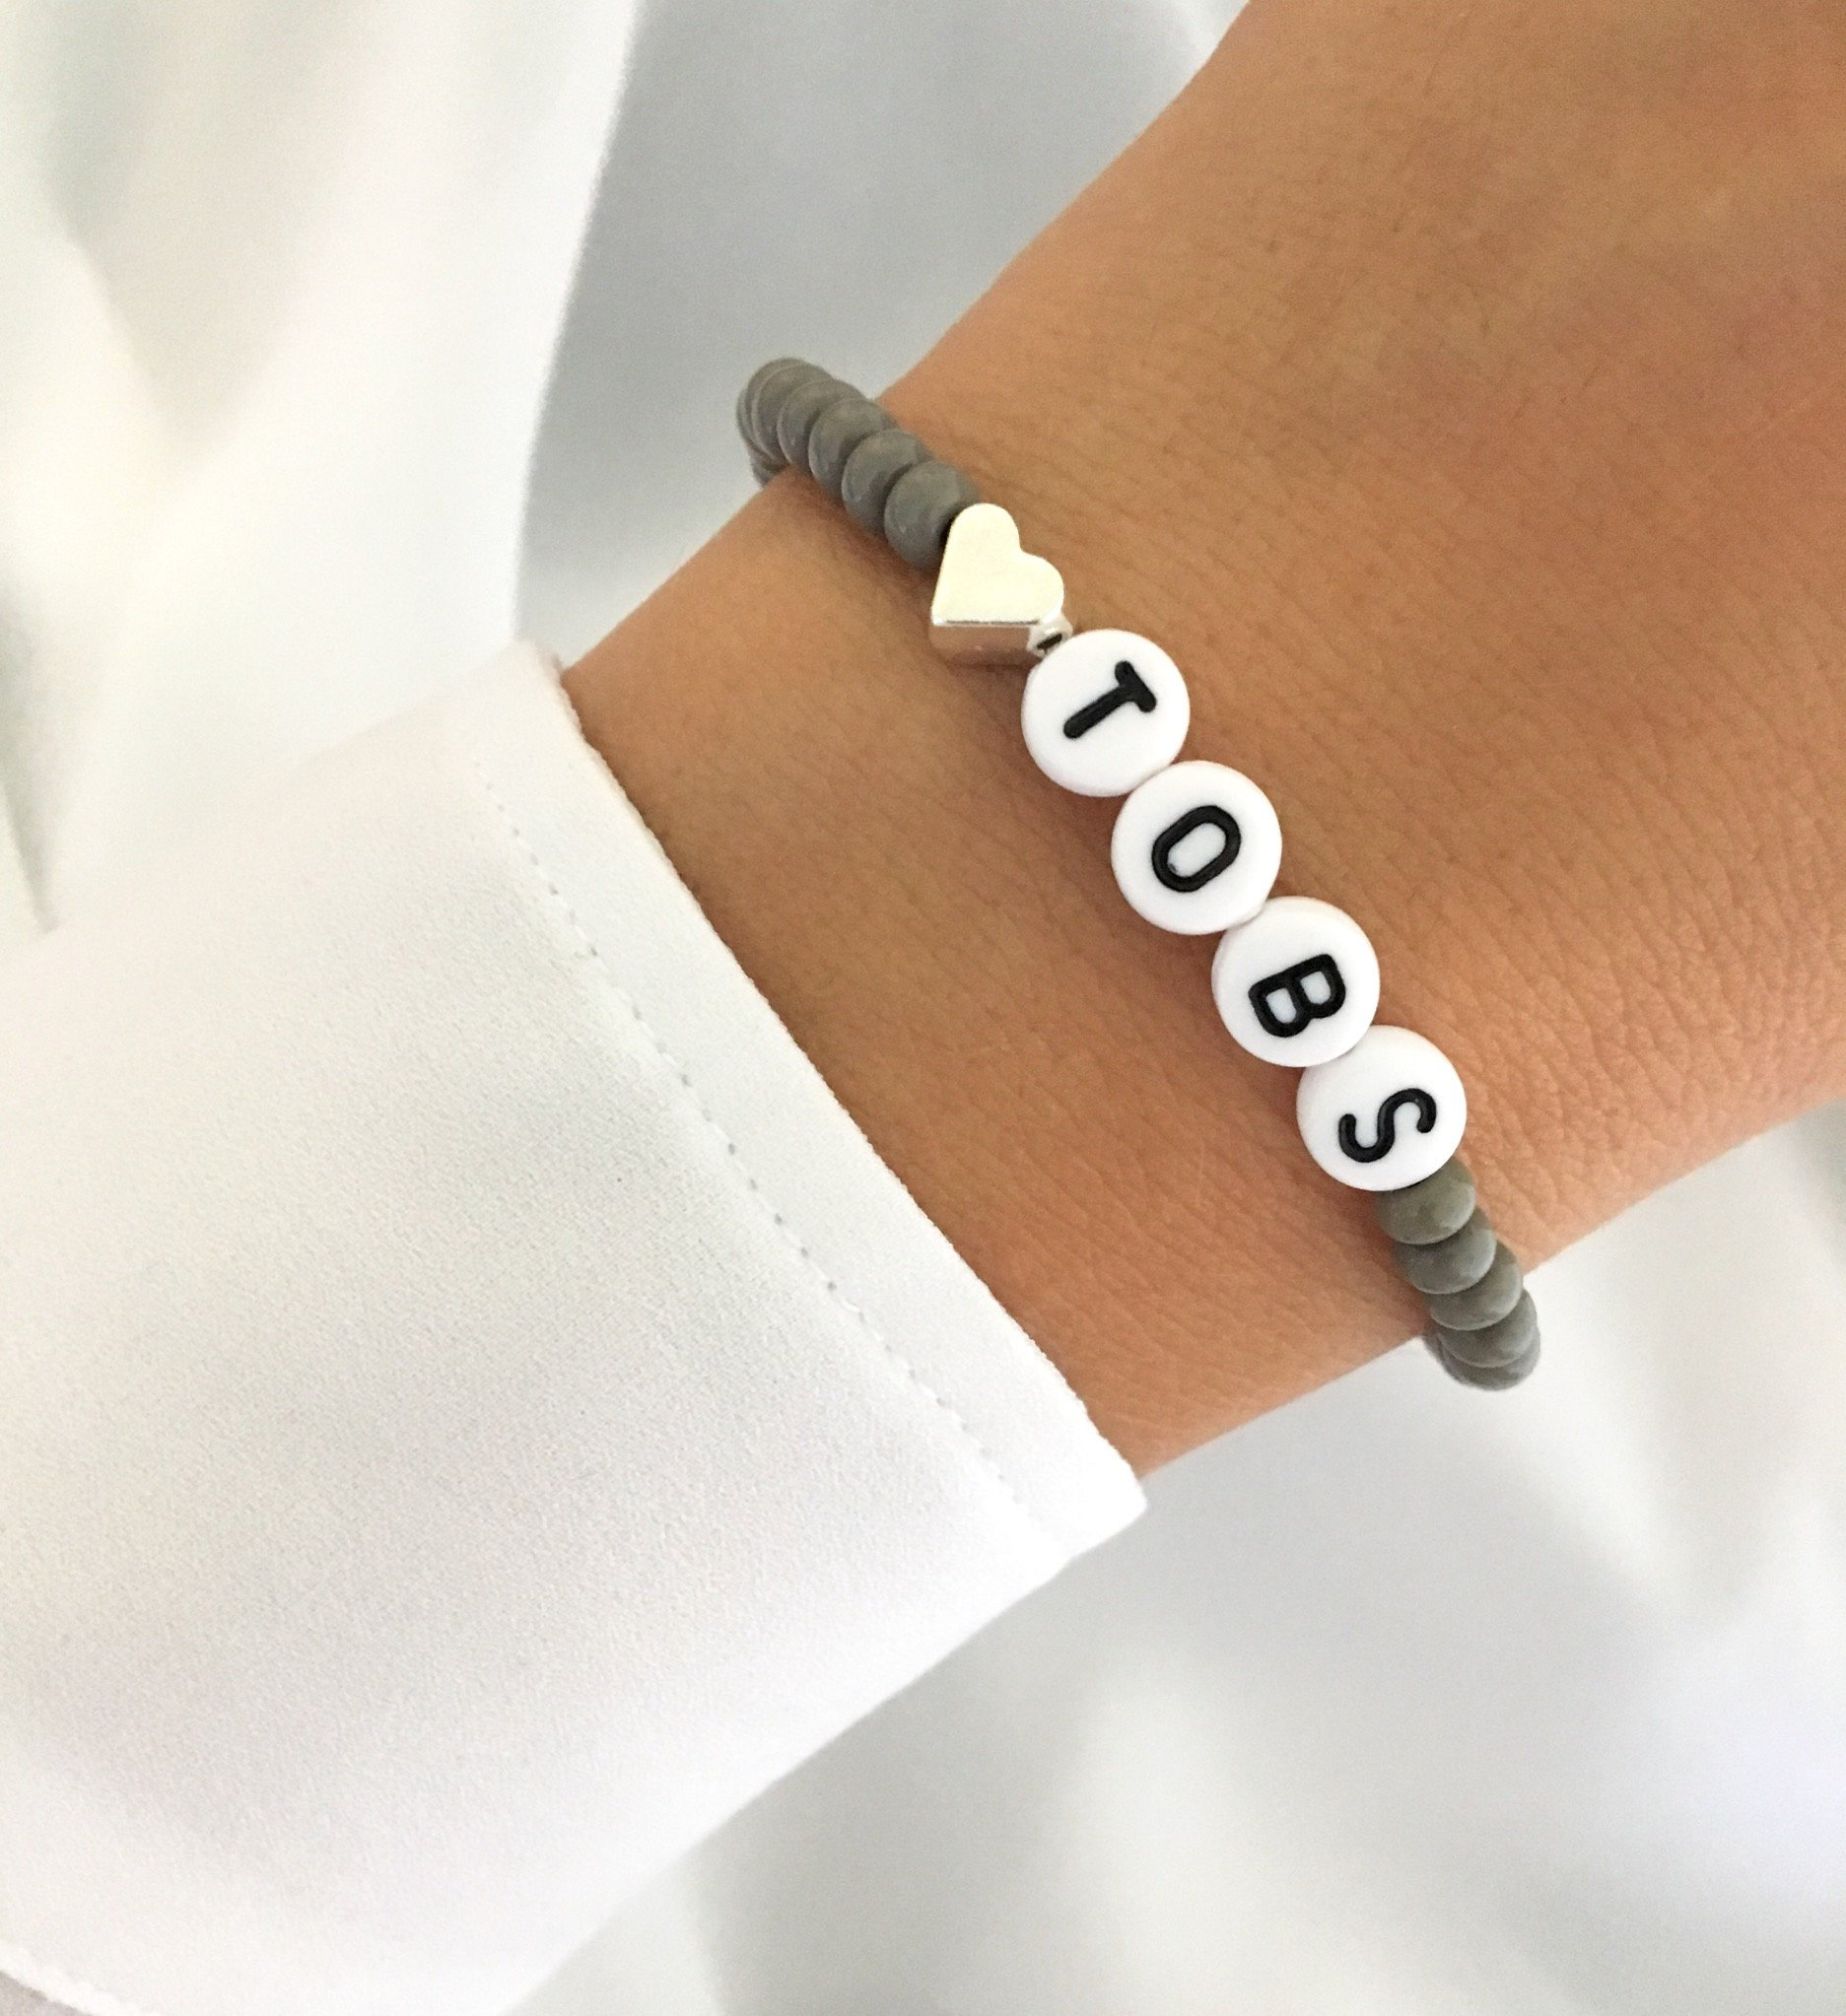 ARMBAND Perlenarmband Grau Buchstabe silberfarben Initialen Herz Geschenkidee